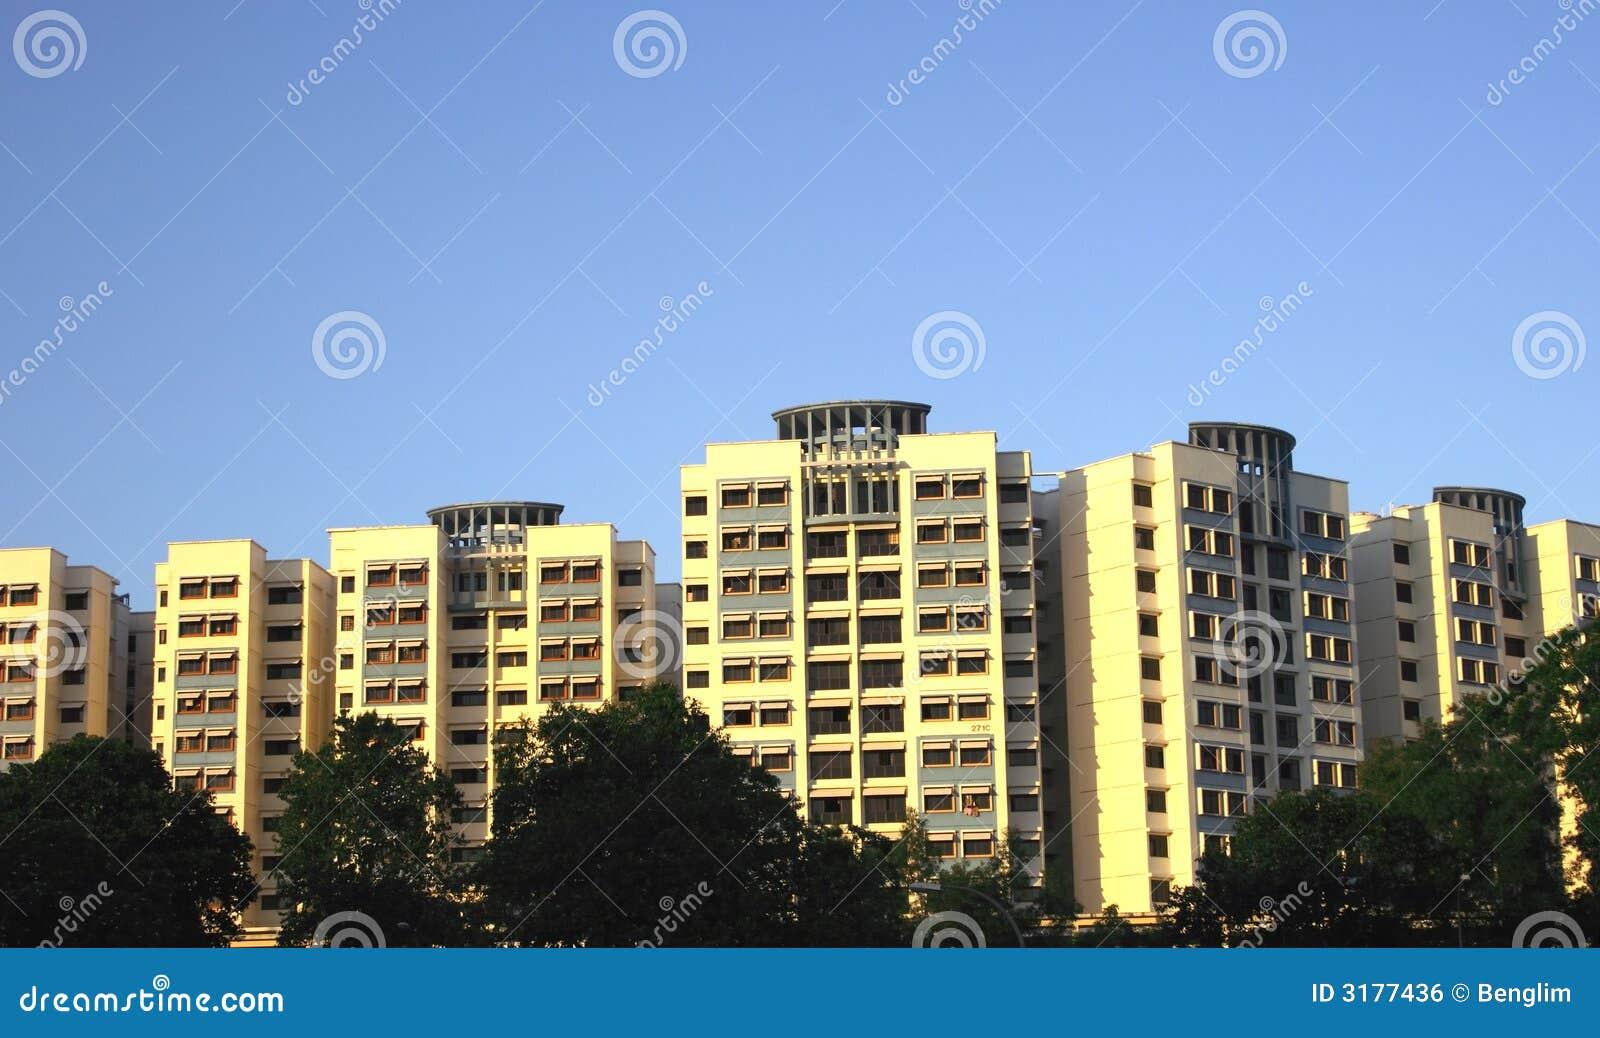 hdb in singapore stock photo image of environment urban 3177436